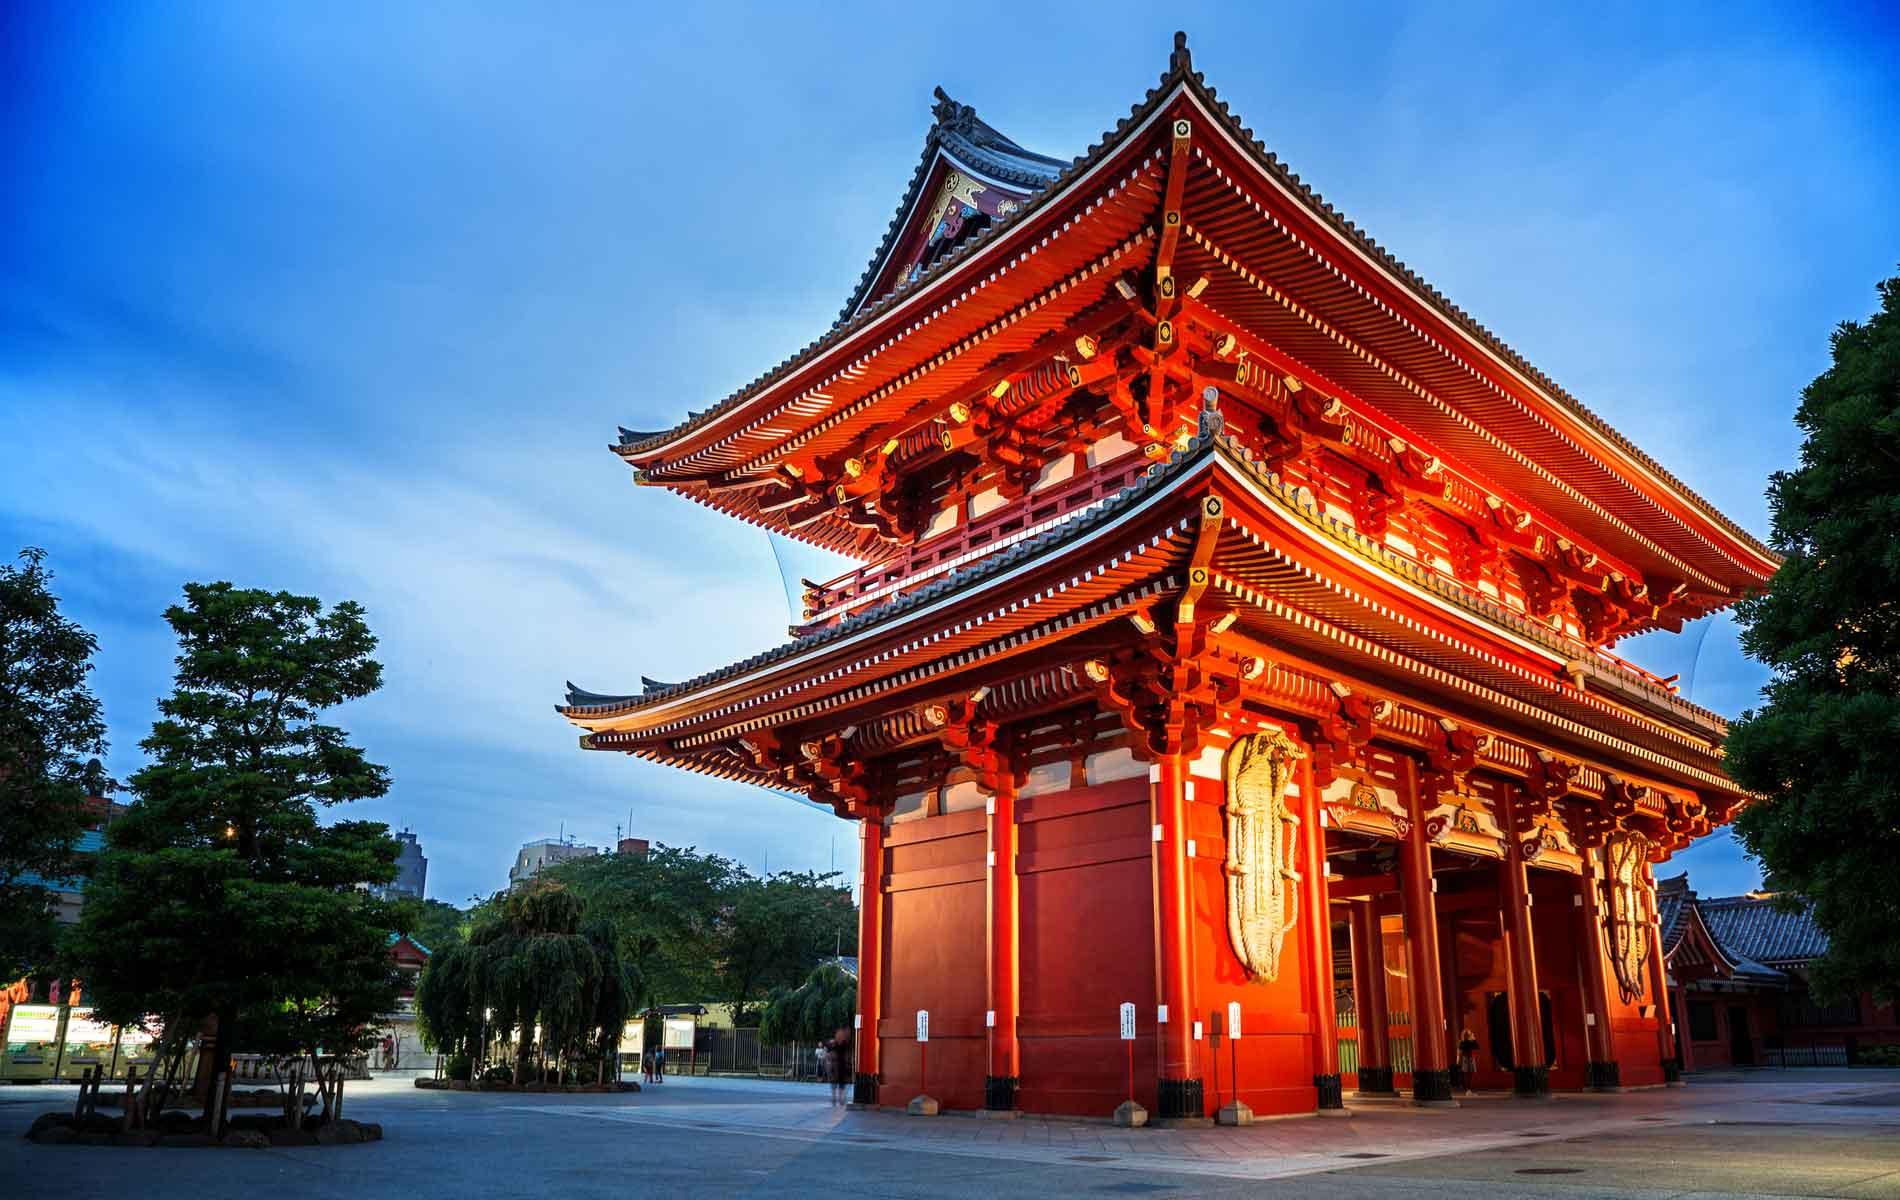 The Kaminarimon gate of the Sensoji Temple, also known as Asakusa Kannon Temple, in Tokyo Japan.